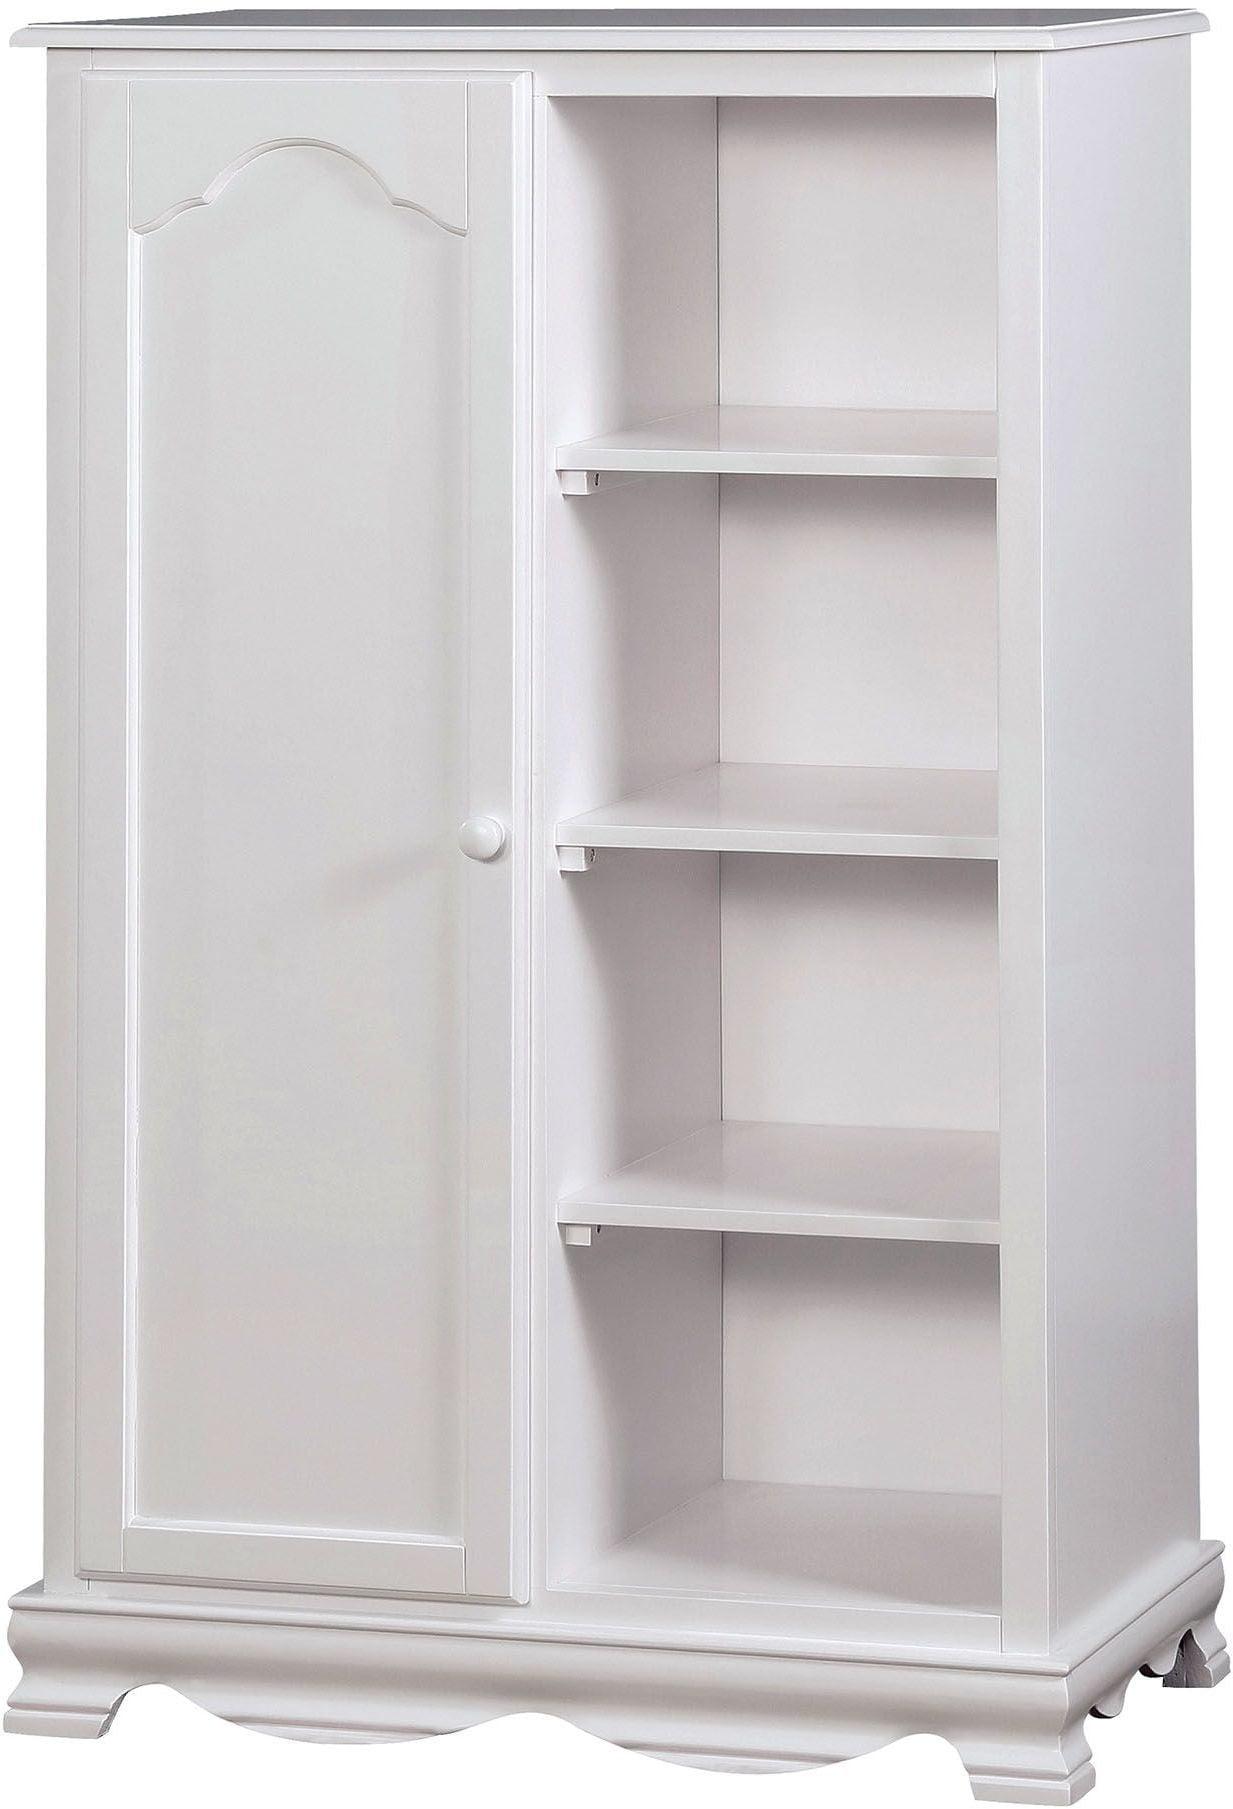 Dani White Closet Storage Cabinet From Furniture Of America  # Muebles Luan Arbo